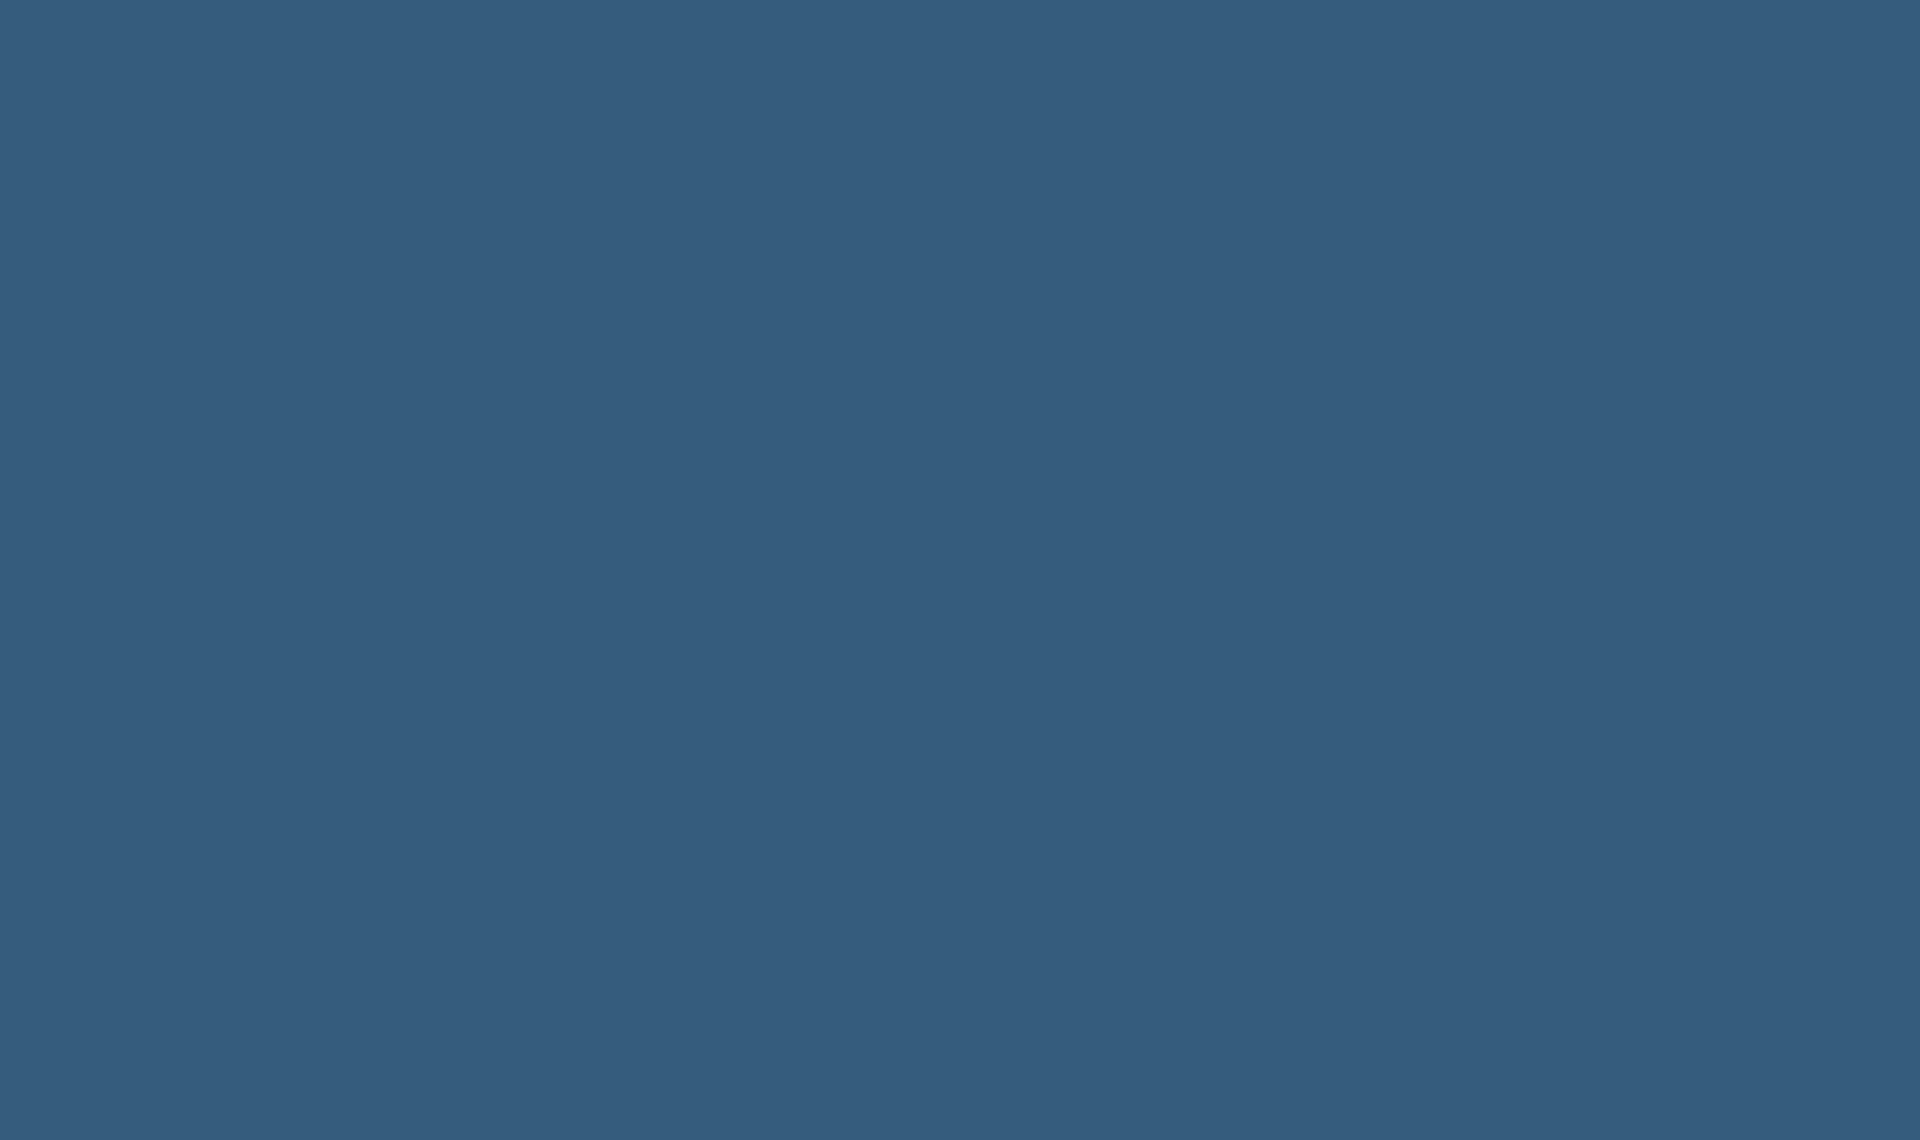 ls-blue